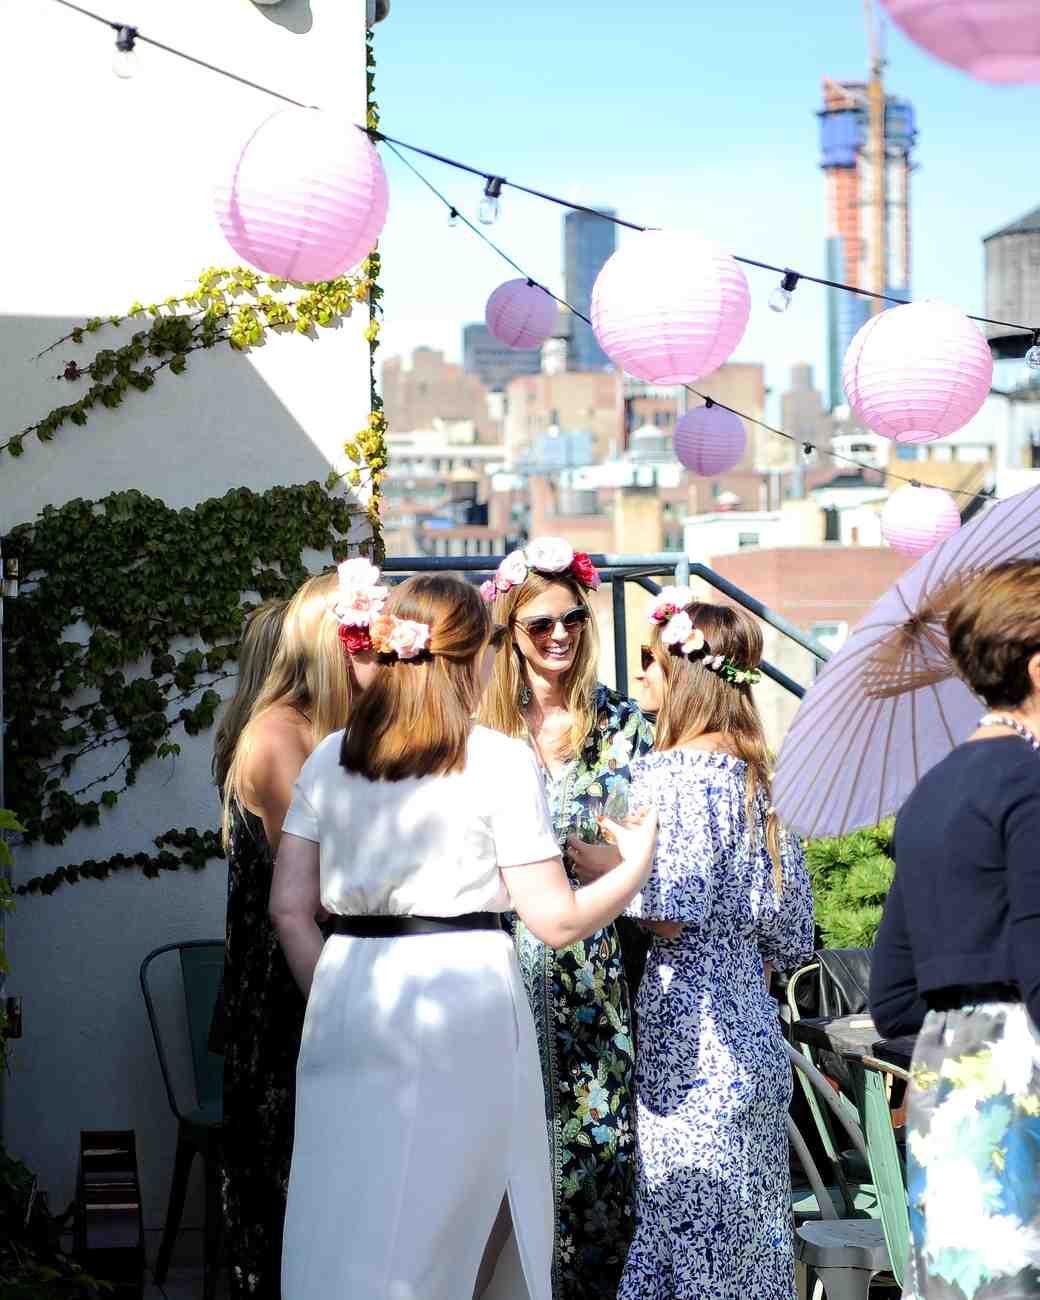 Annie Atkinson's Rooftop Bridal Shower Location